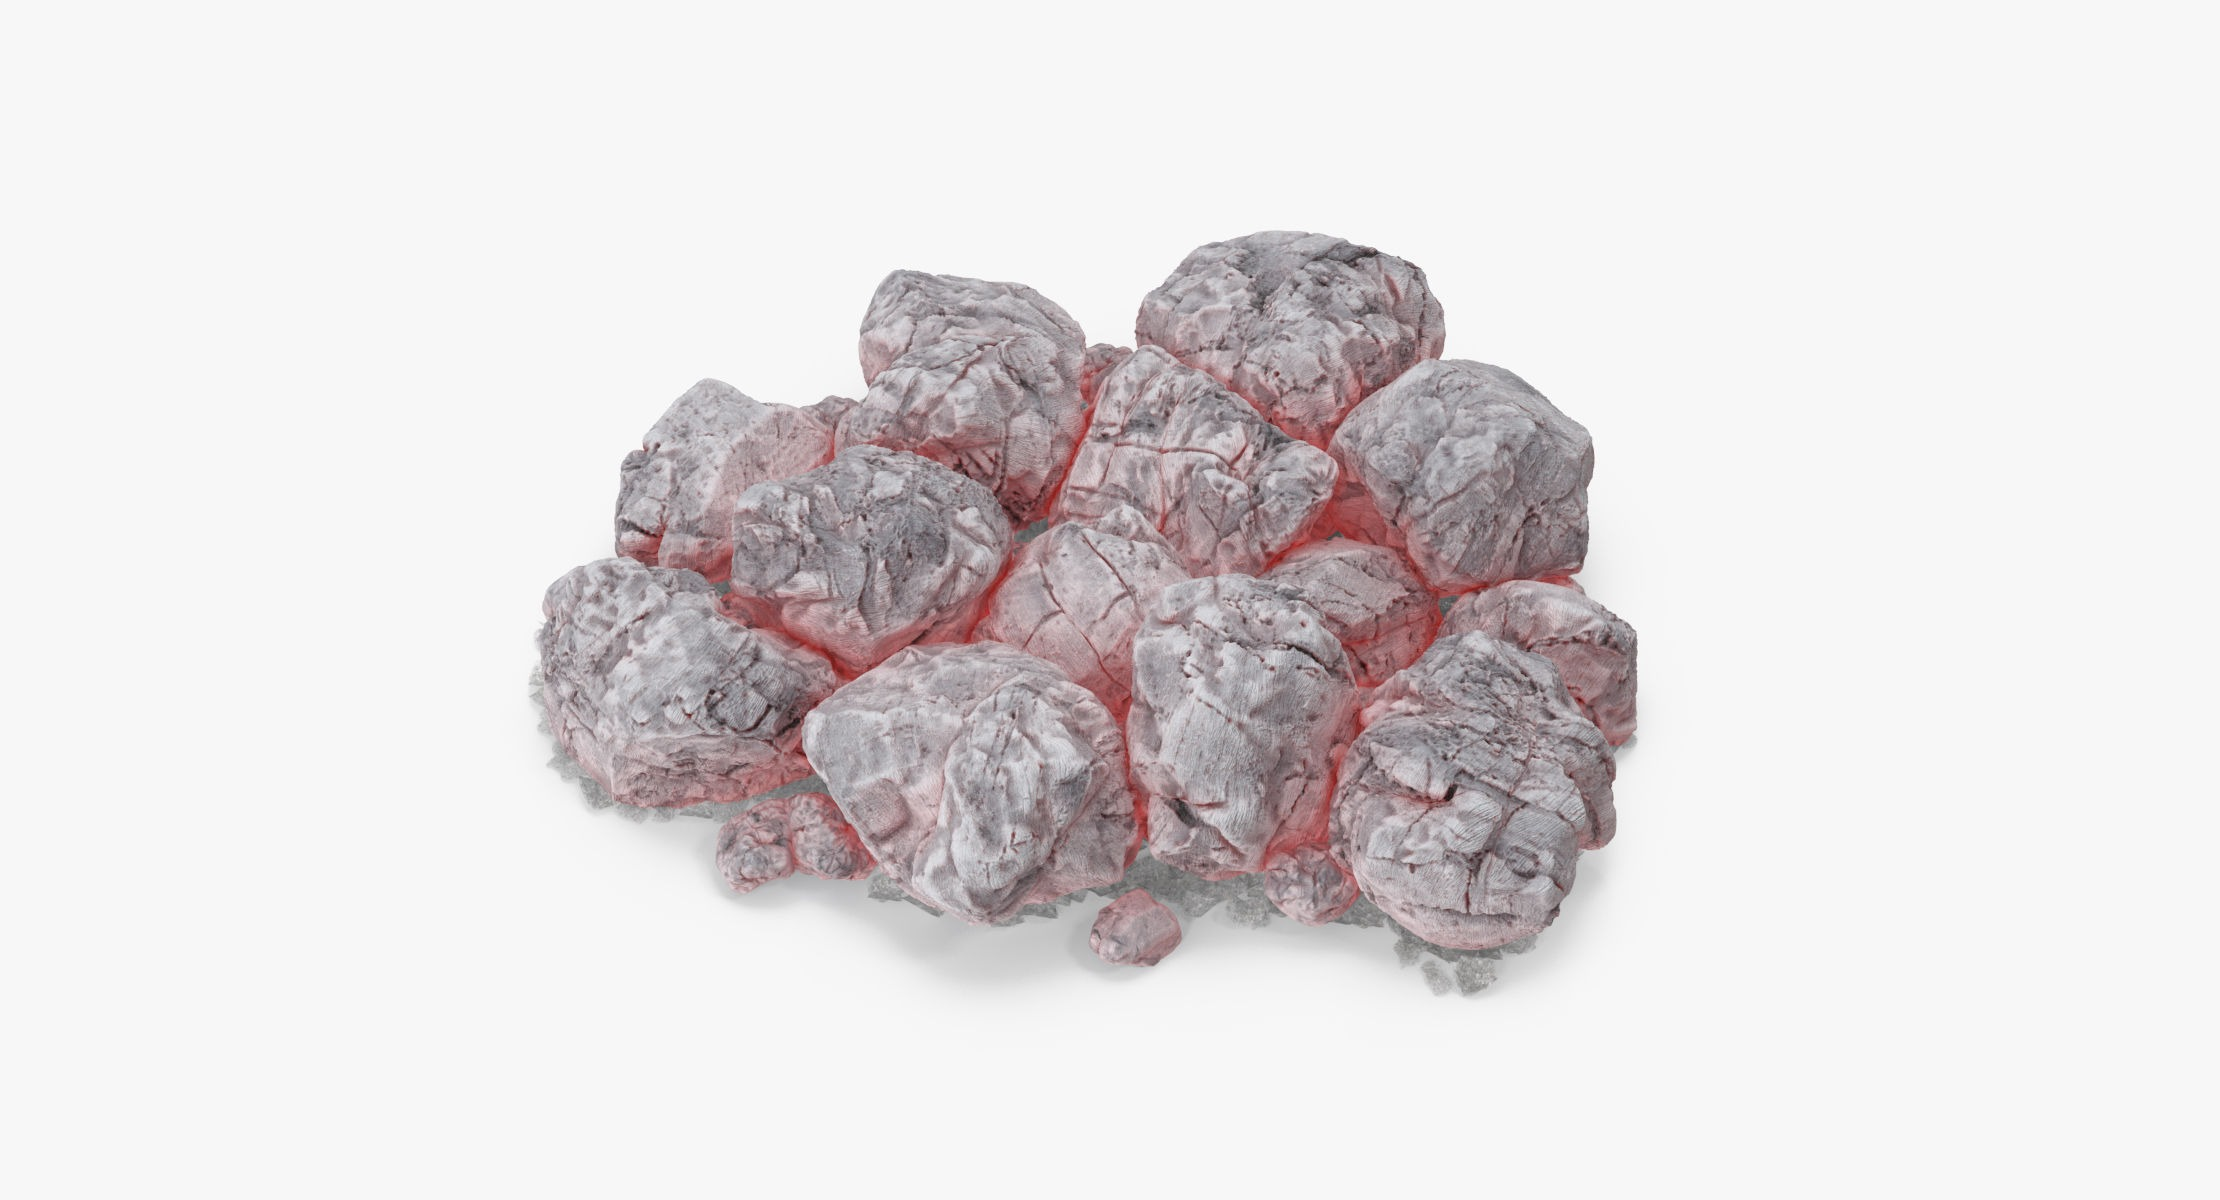 Pile of Buring Coals - reel 1